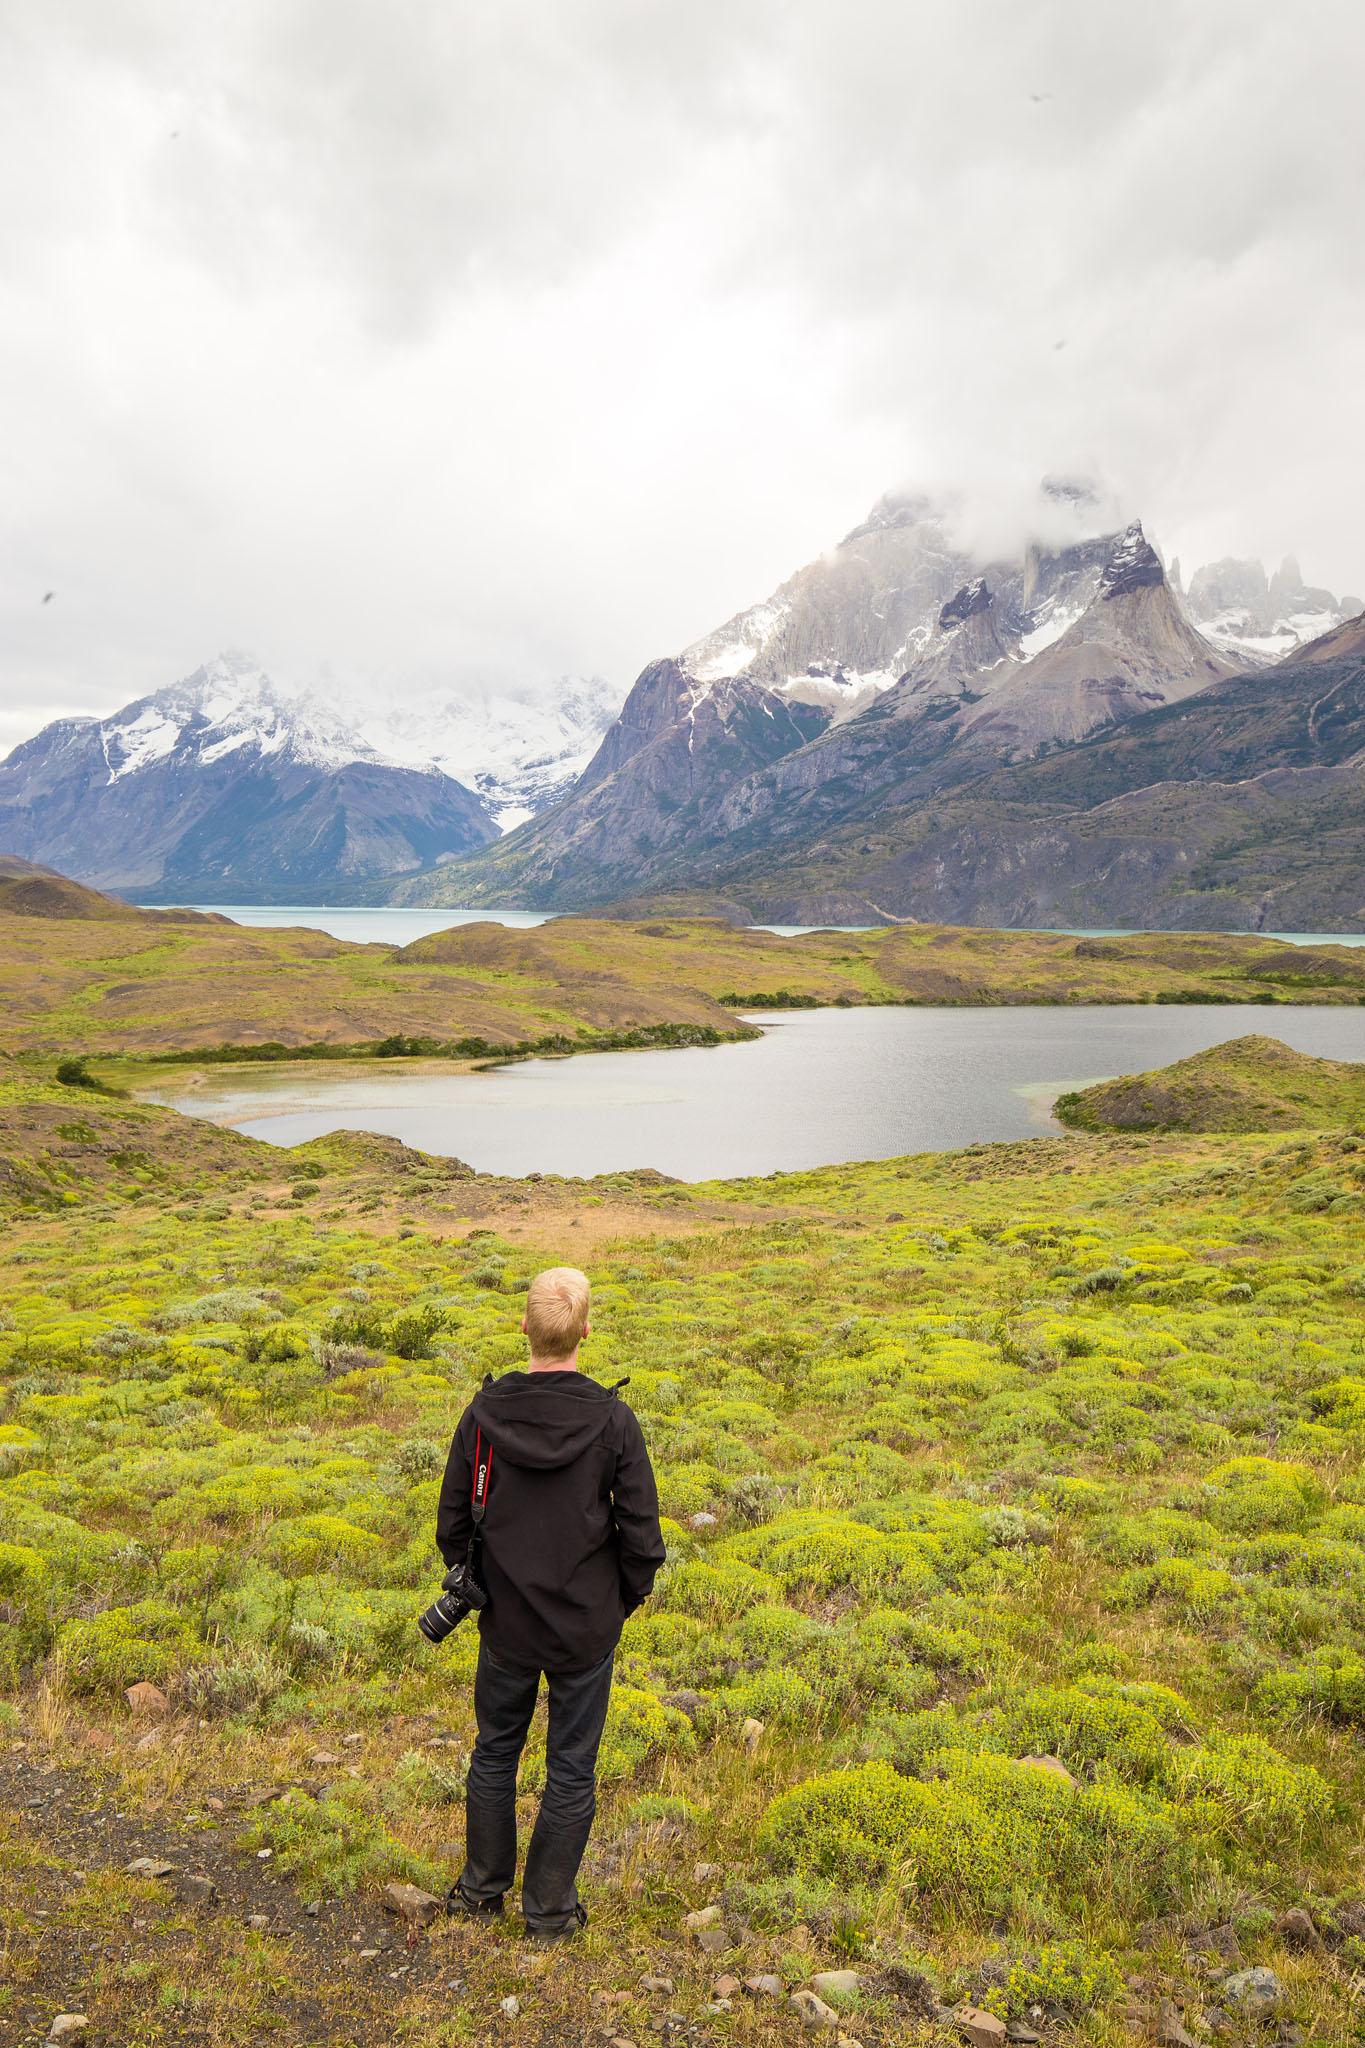 Wedding-Travellers-Overlanding-Destination-Wedding-Chile-Torres-del-Paine-mountain-lake